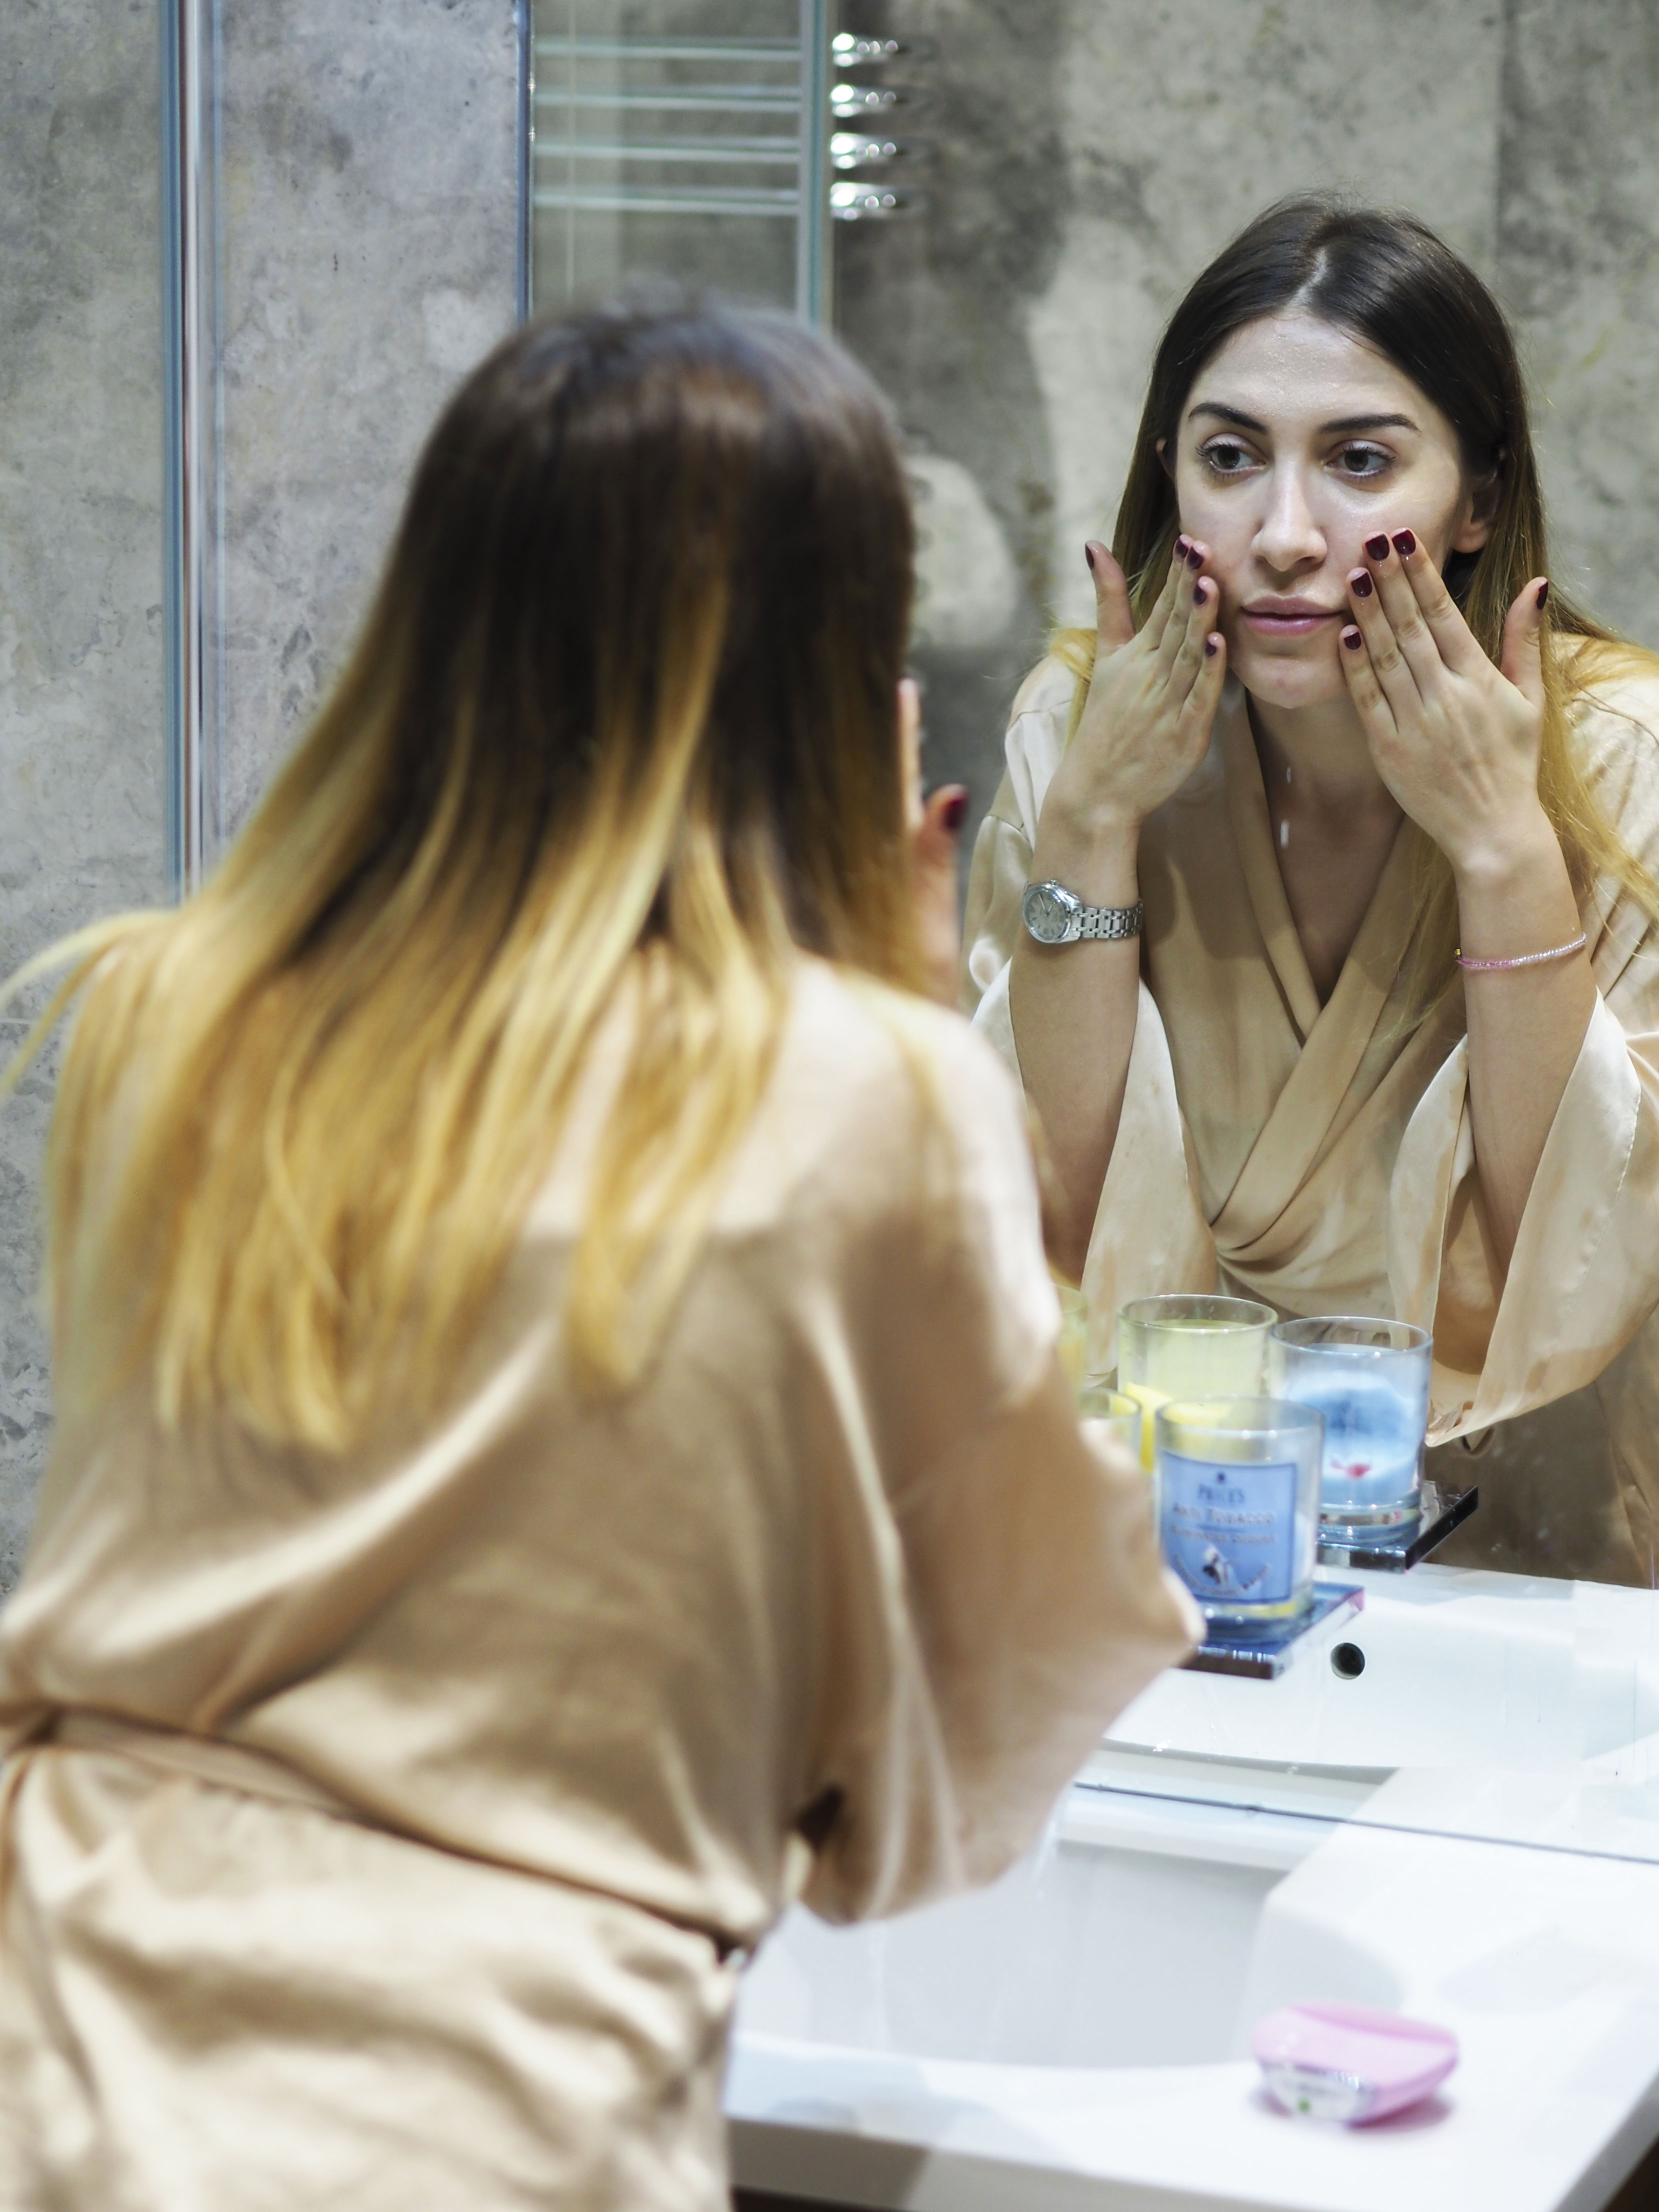 FOREO LUNA mini 2 review - Clear Skin in One Minute